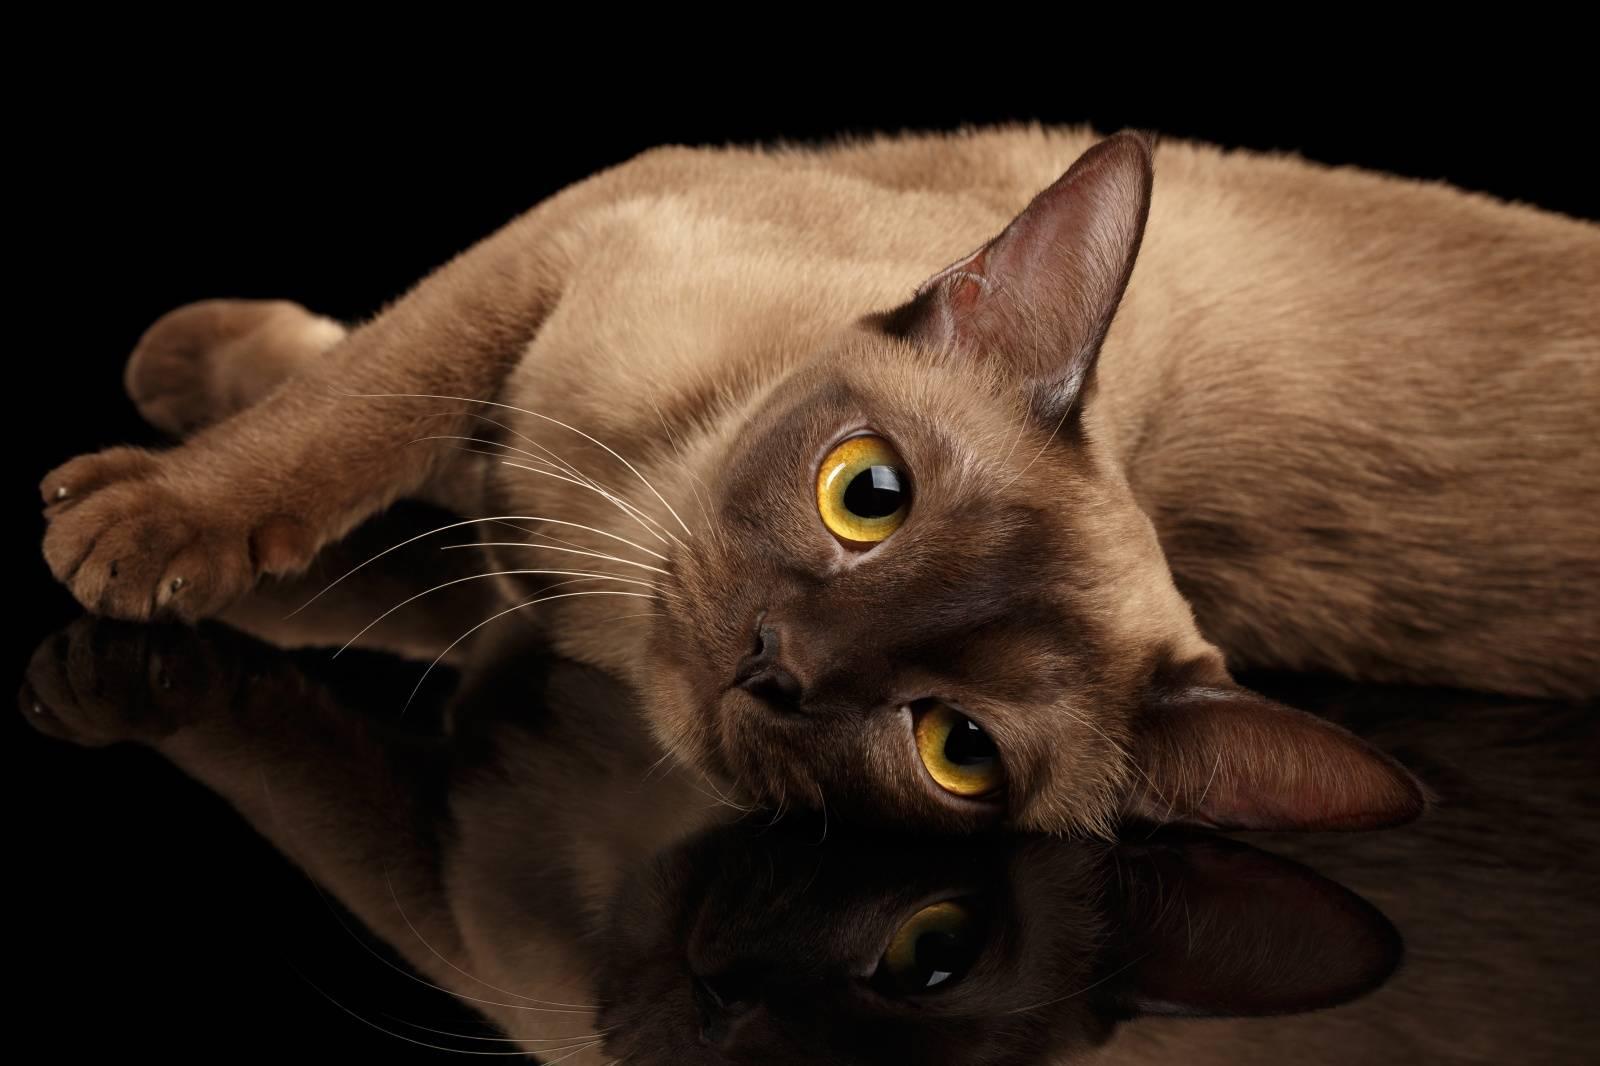 Бурманская кошка, характер котят и котов бурм